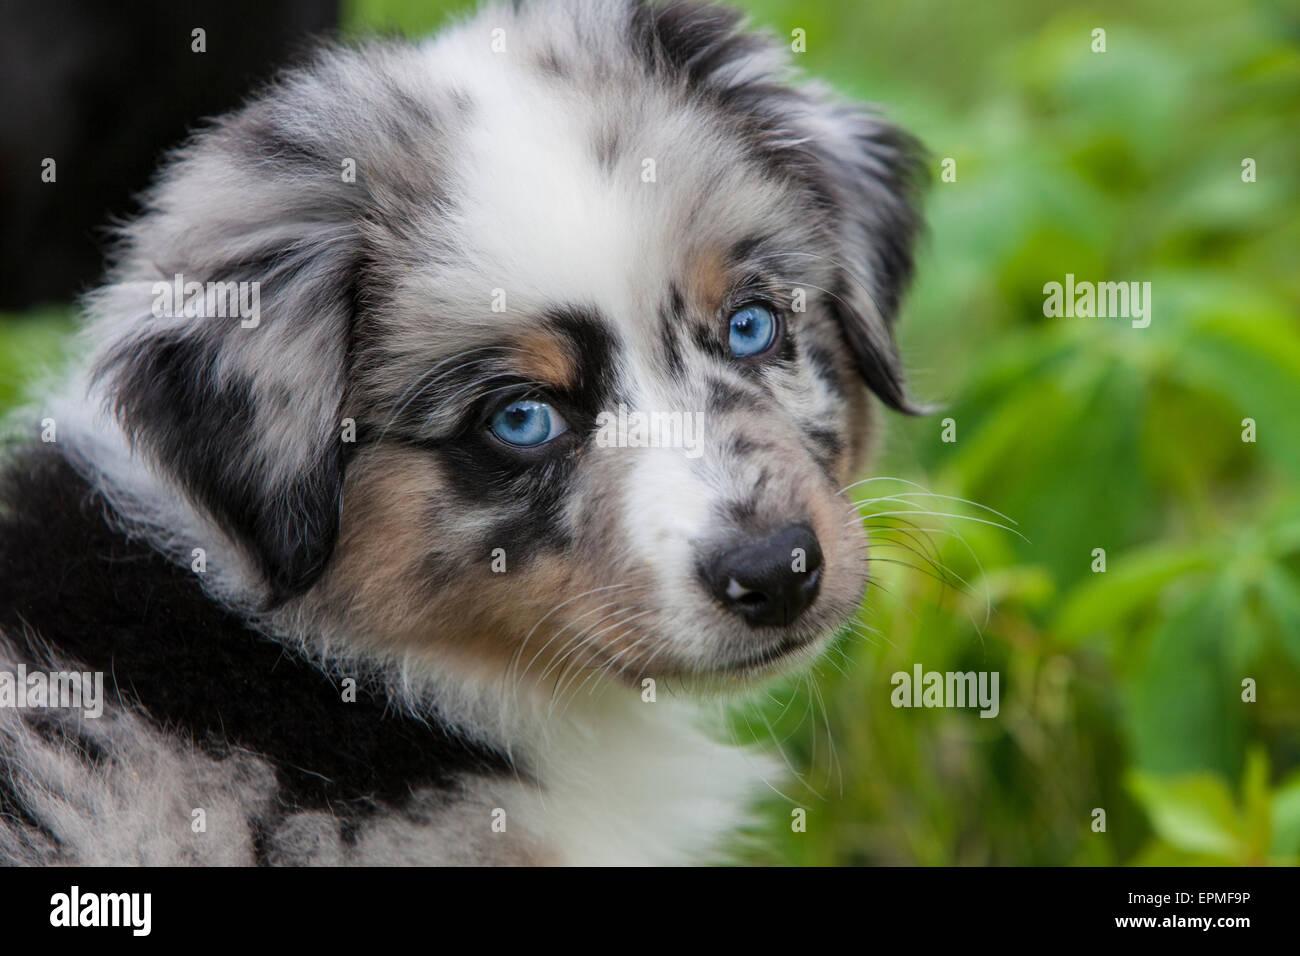 Australian Shepherd Puppies Are Agile Energetic And Mature Into Stock Photo Alamy